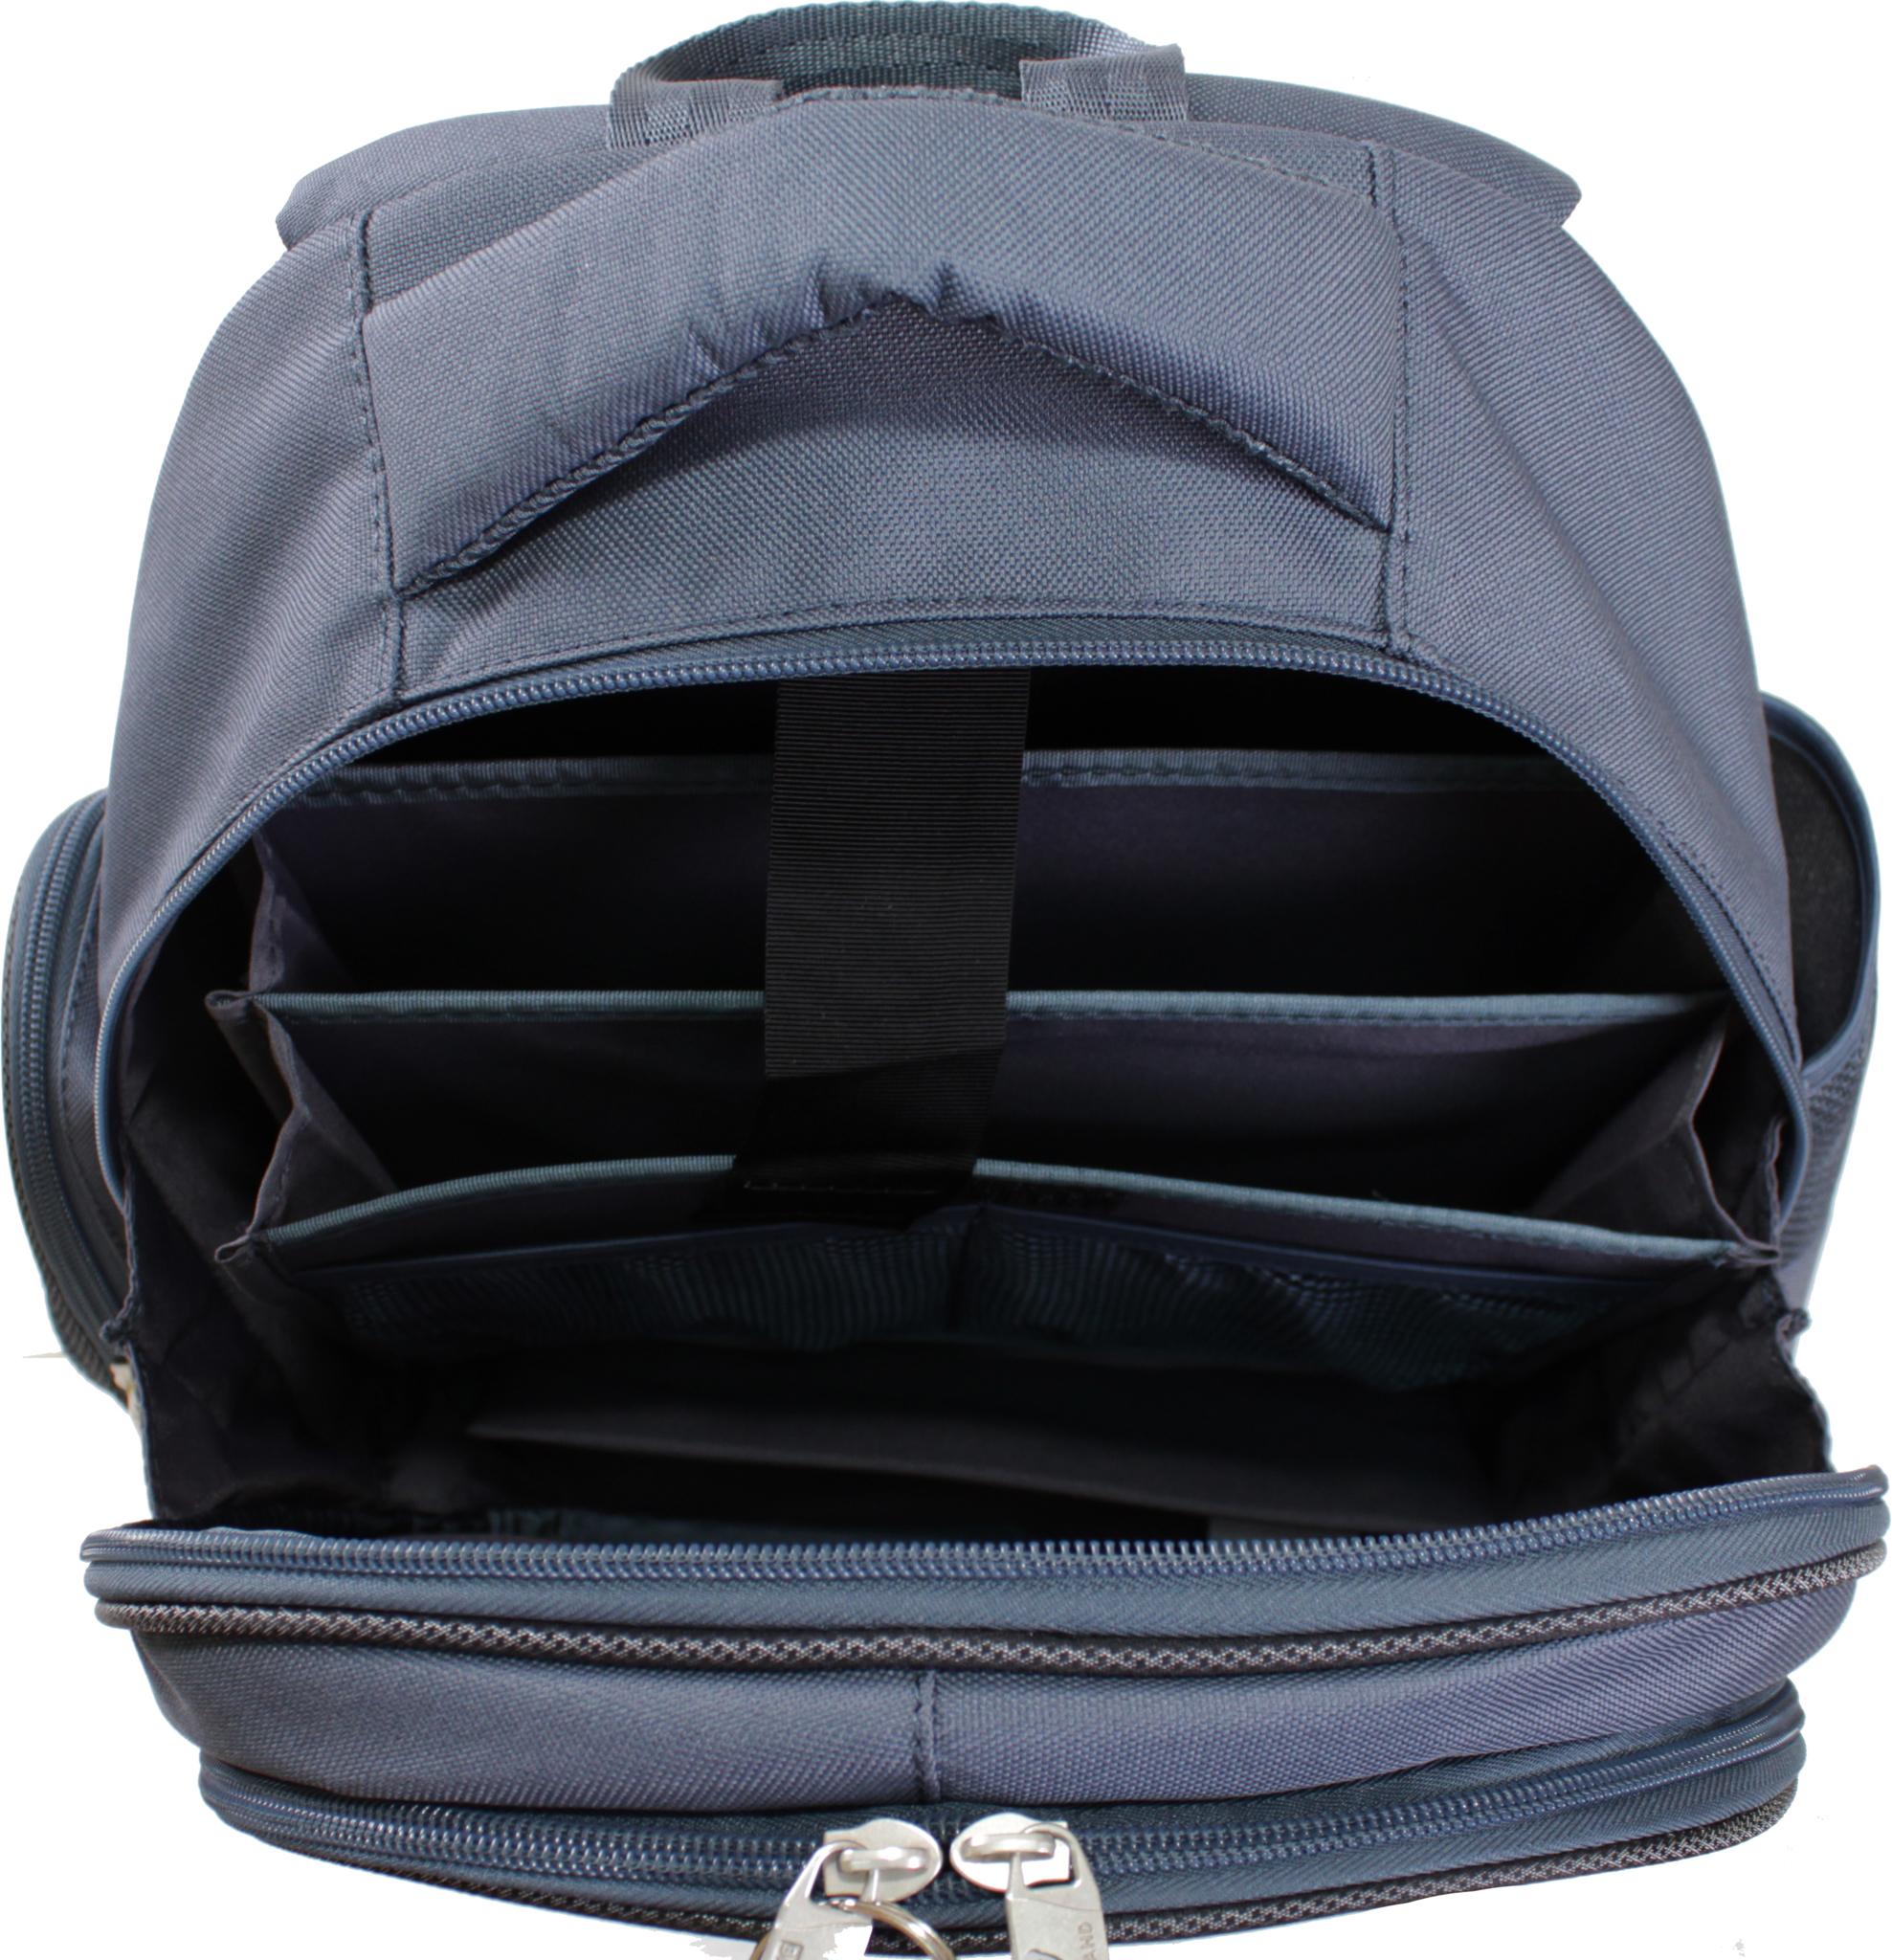 Рюкзак Bagland Pupil 14 л. серый 175 К (0012566)